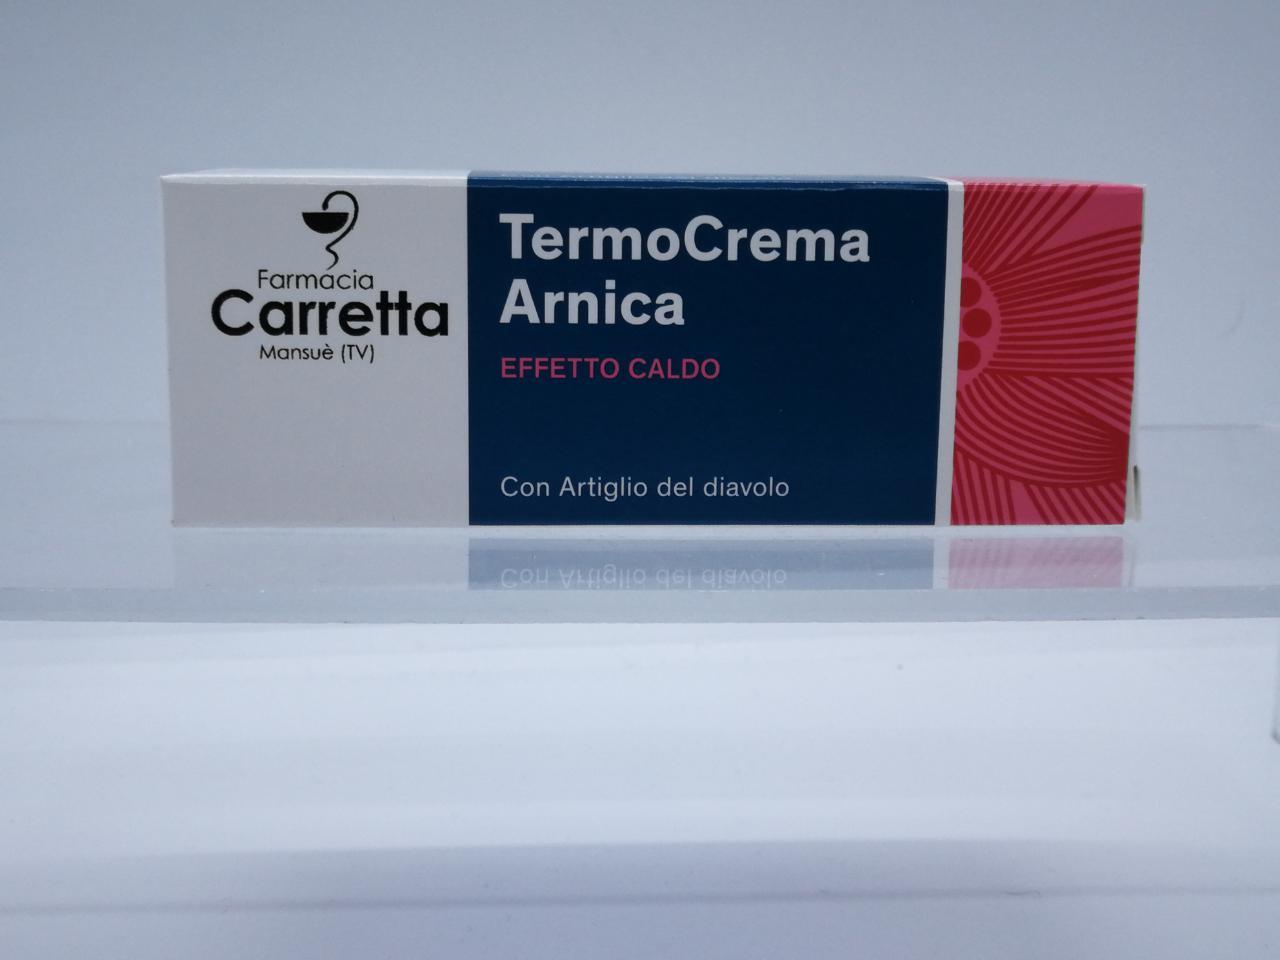 LFP TERMOCREMA ARNICA 50ML - Farmalandia